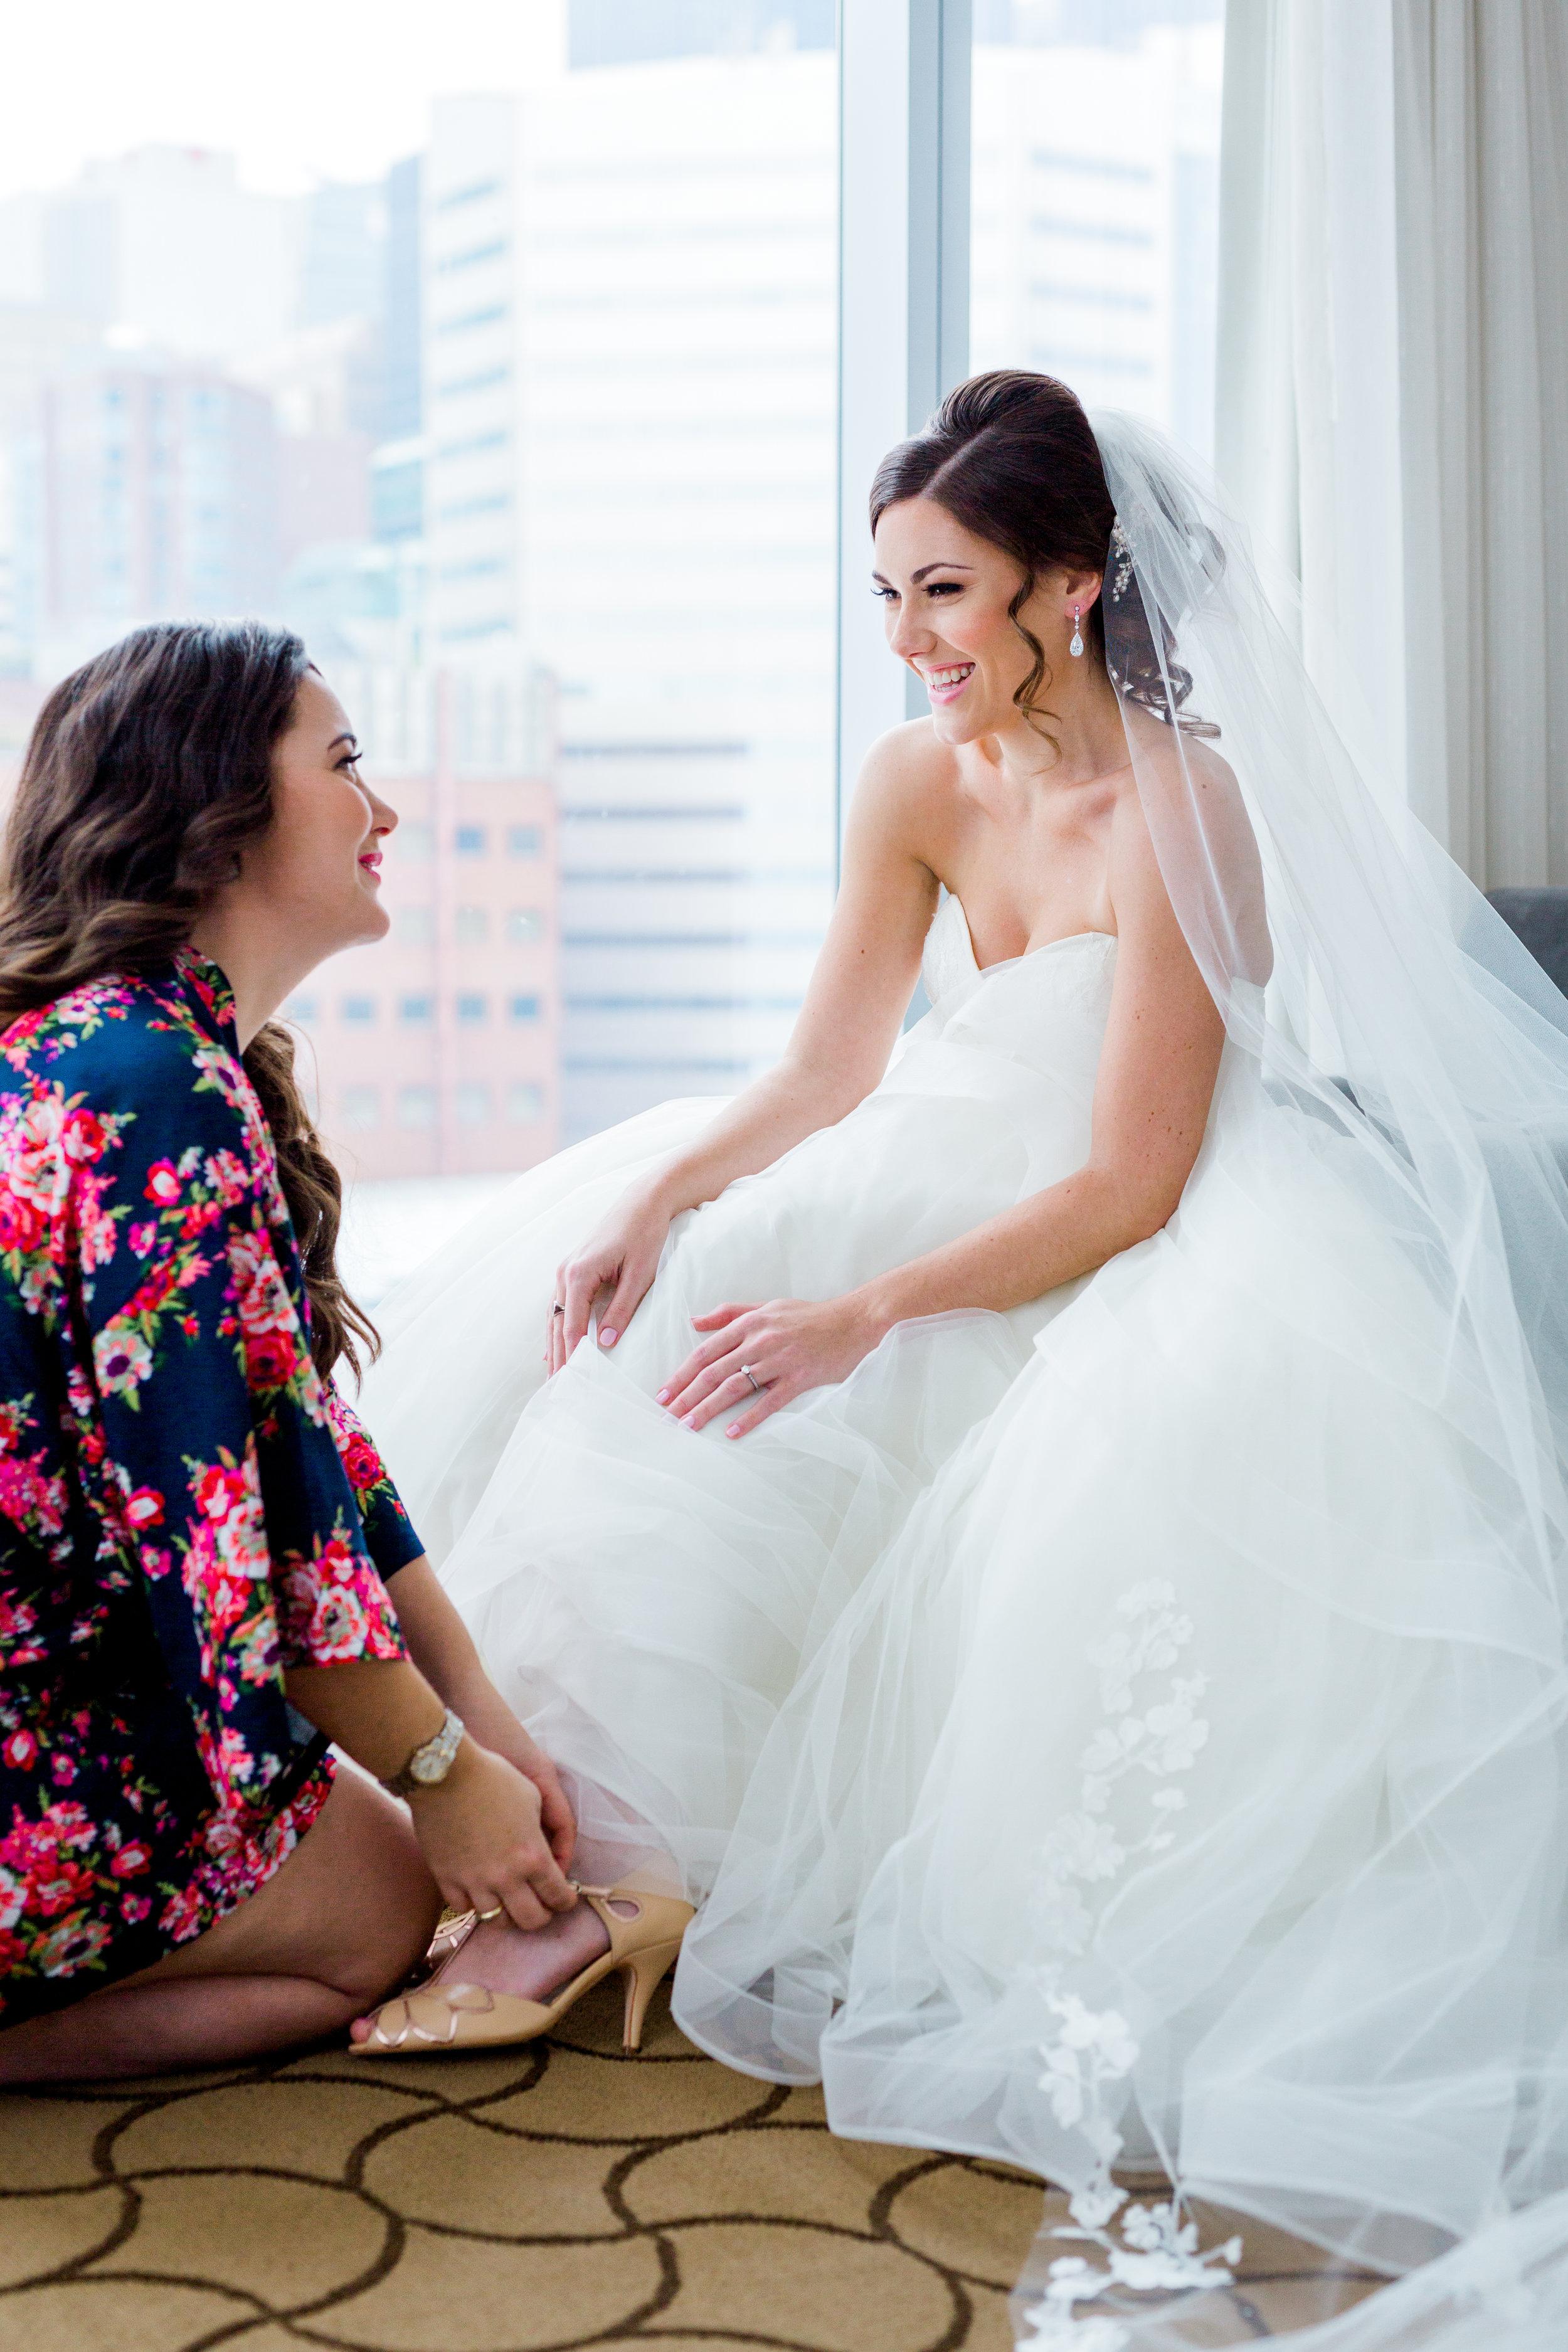 Amir_Danielle_Whitfield_Wedding_Steam_Whistle_Toronto_139.jpg